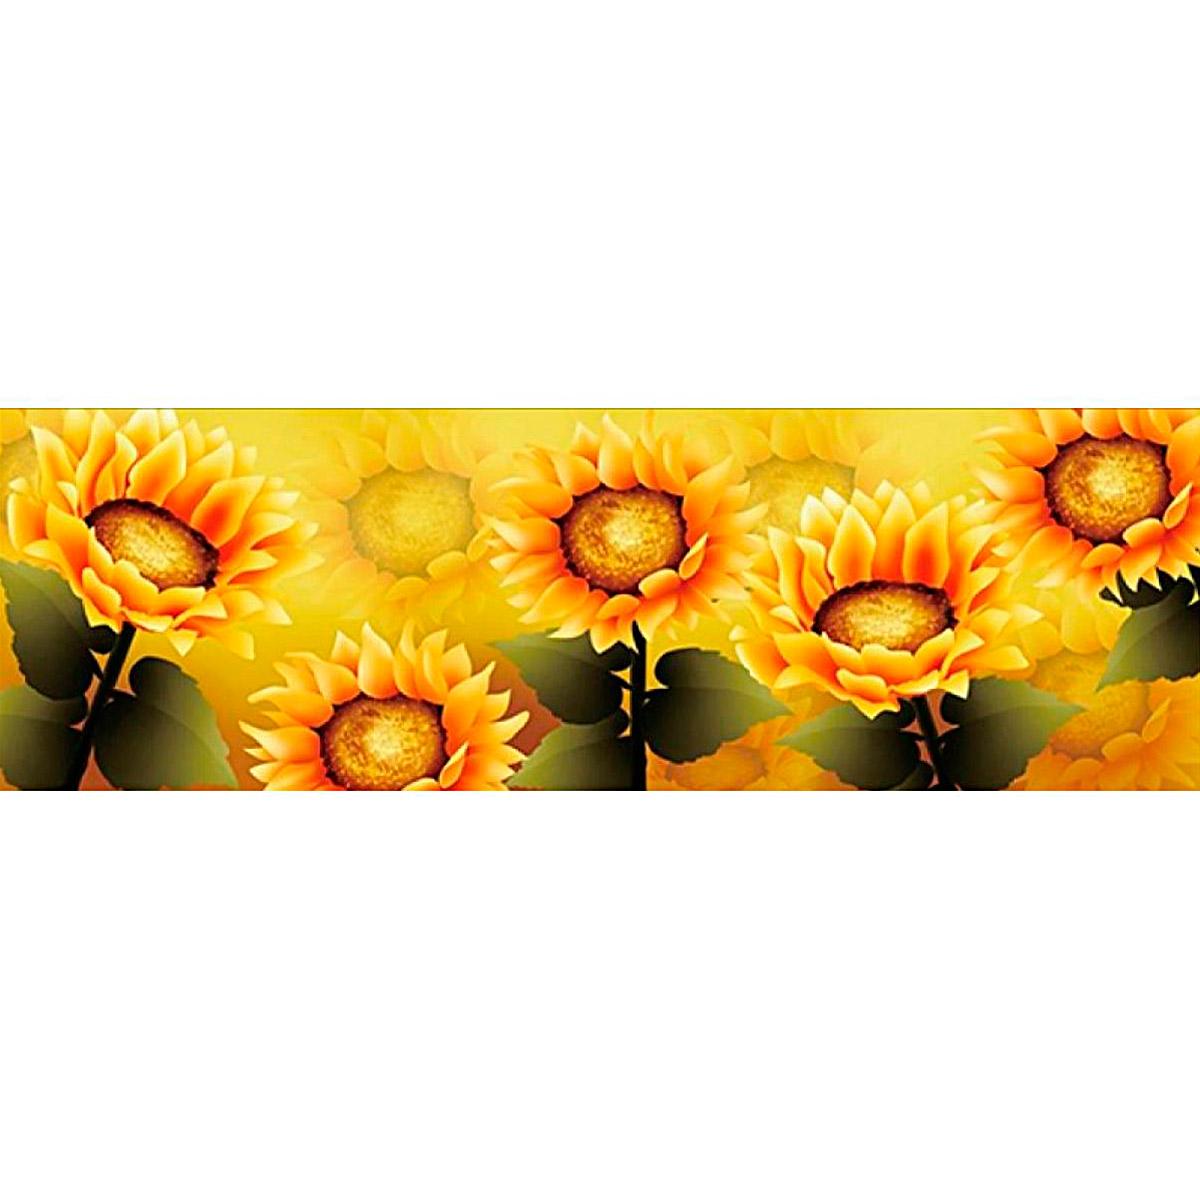 51286 Картина со стразами 5D 'Подсолнухи', 135x54см